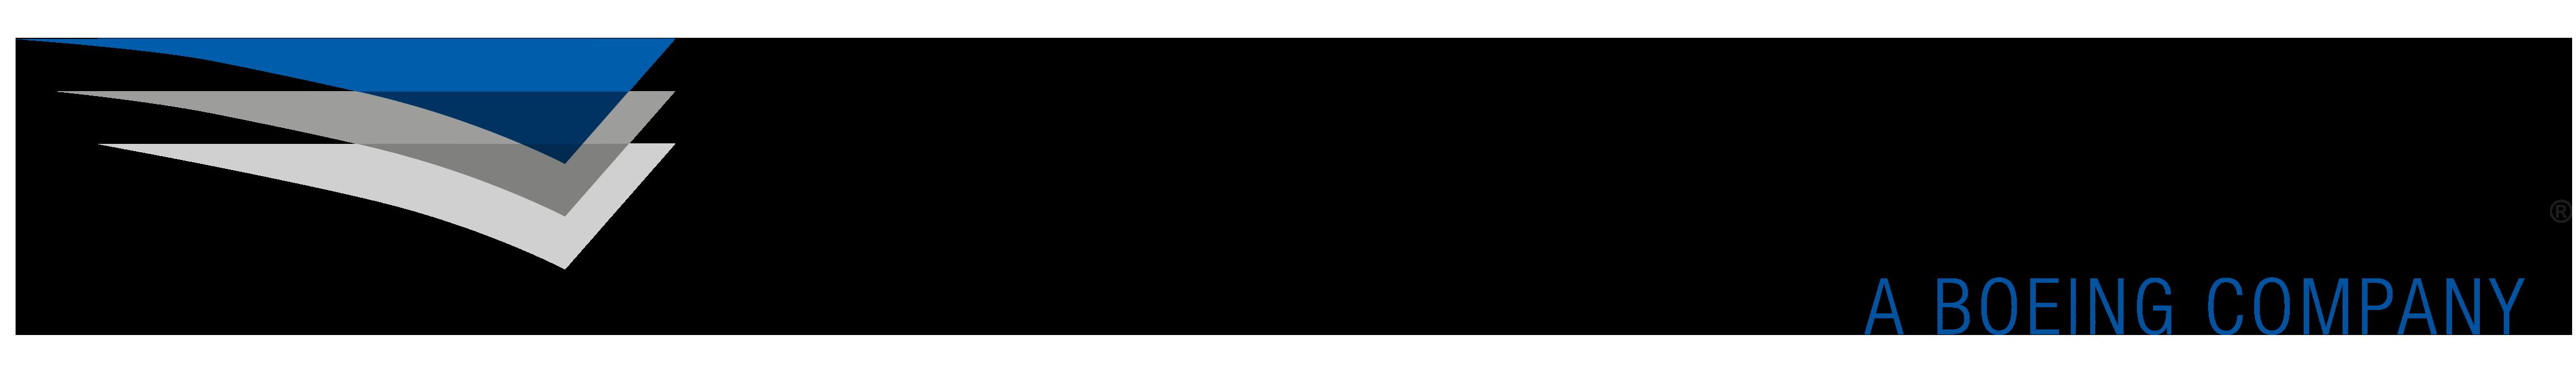 jeppesen logos download air force logo vector free air force logo vector blue